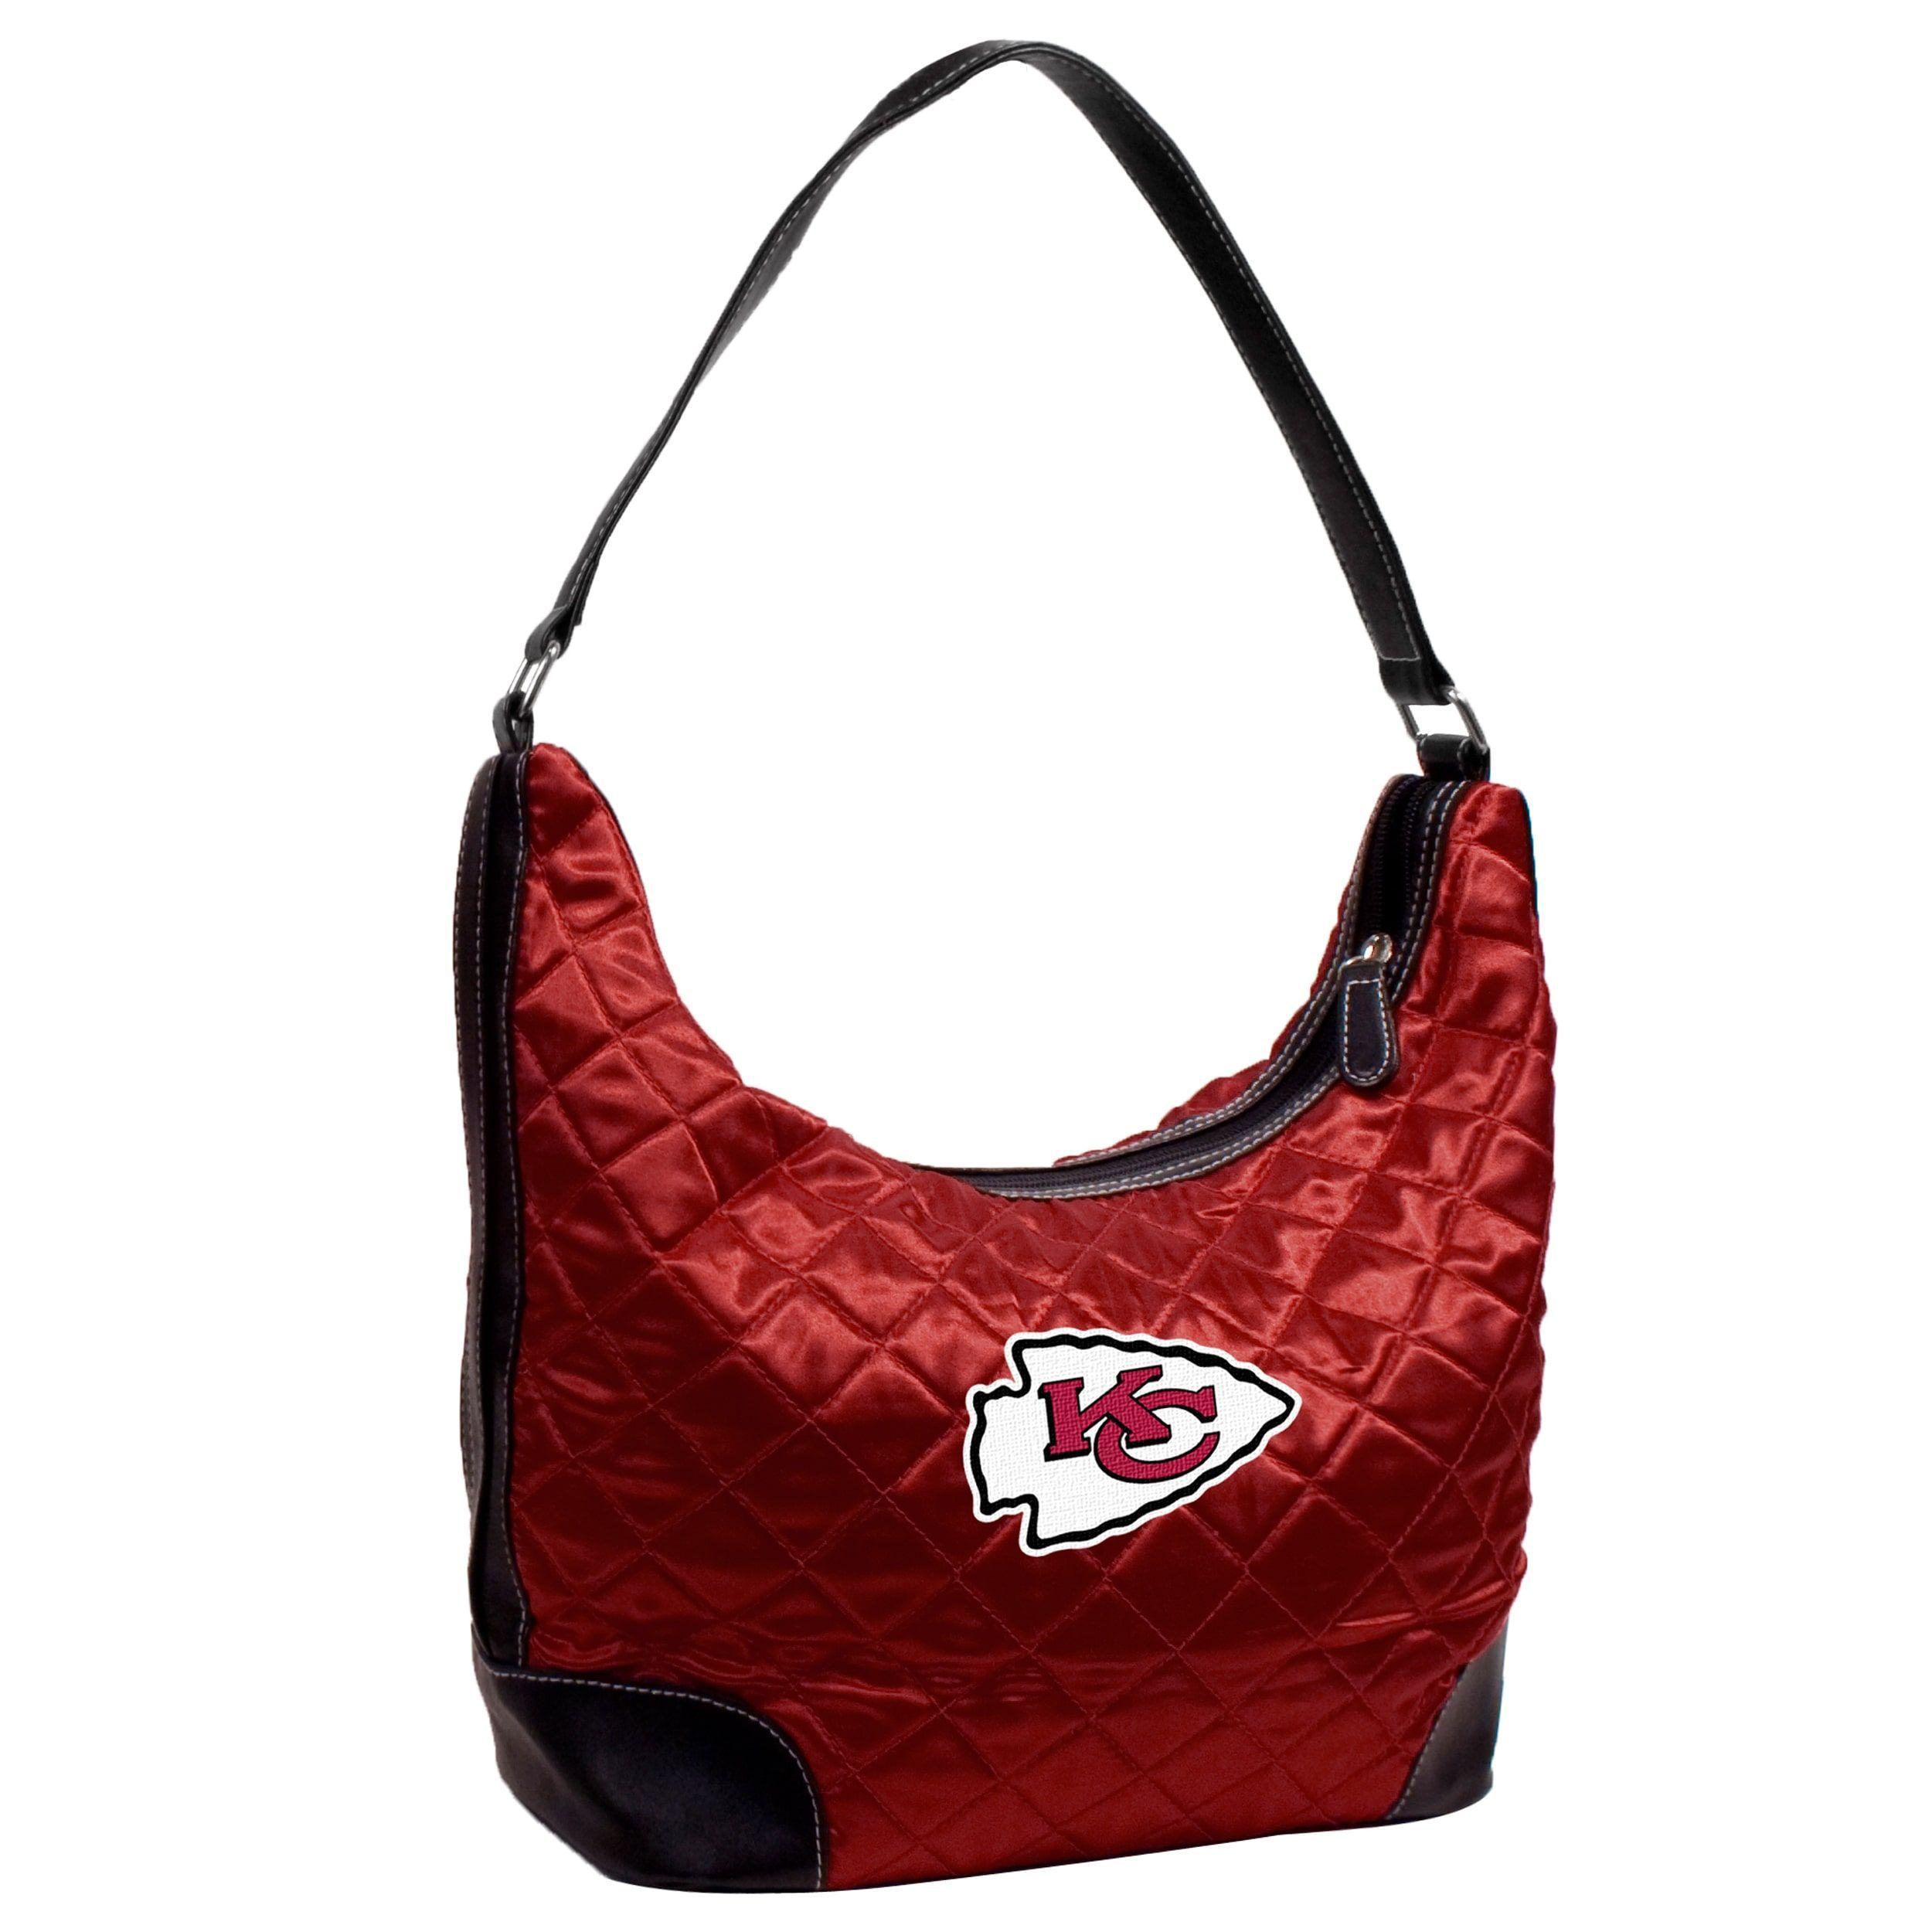 Little Earth NFL Kansas City Chiefs Quilted Hobo Handbag, Women's, Blue